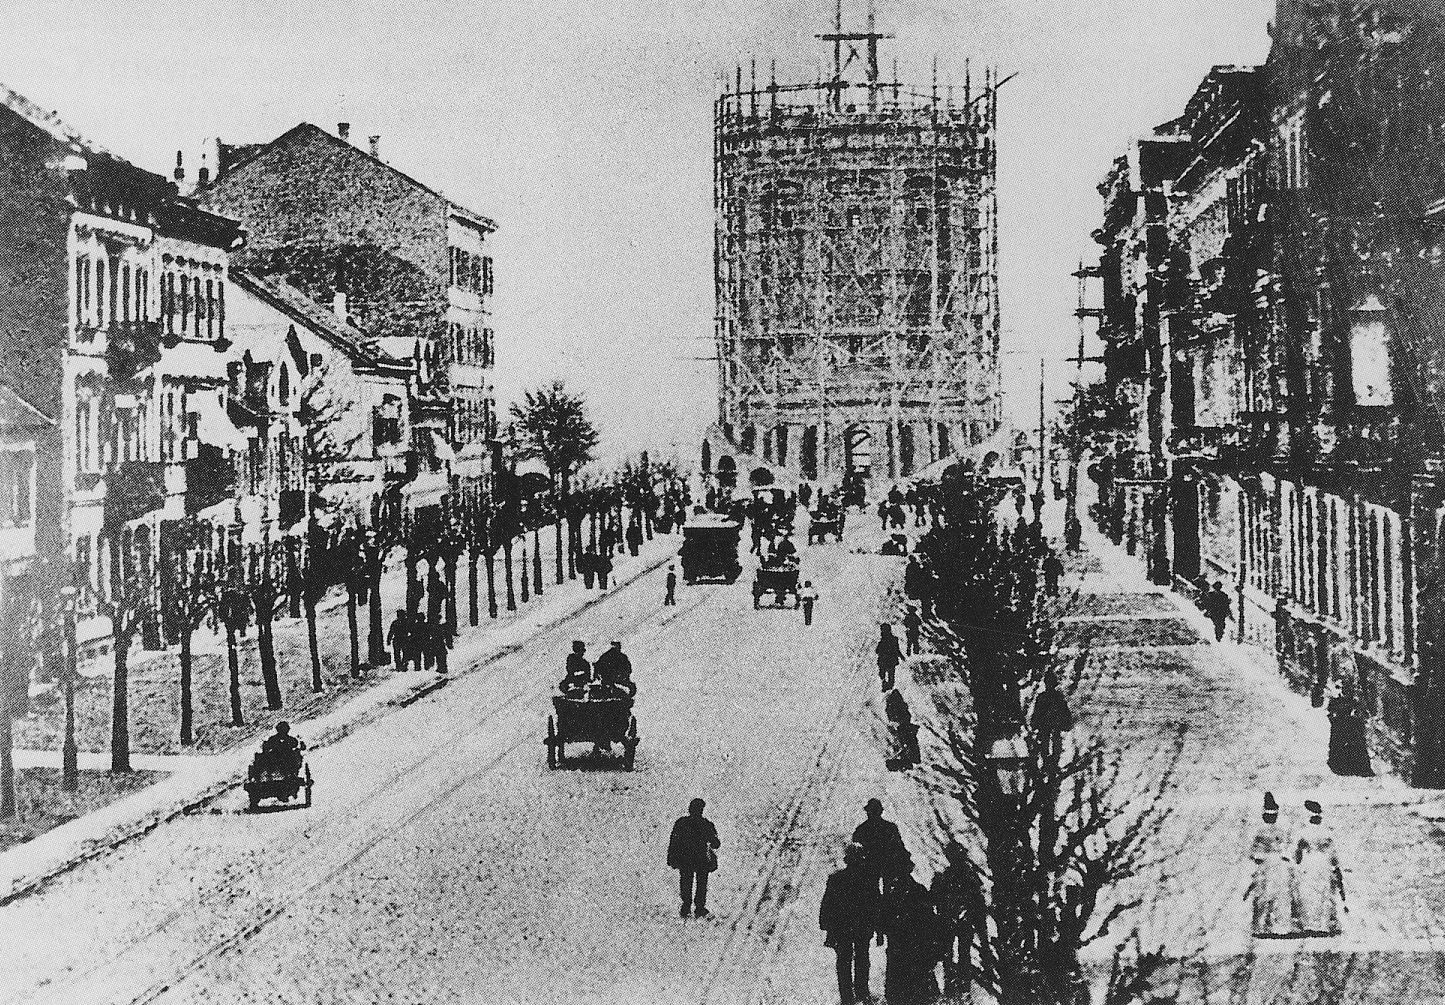 File:Wasserturm Mannheim 1887.jpg